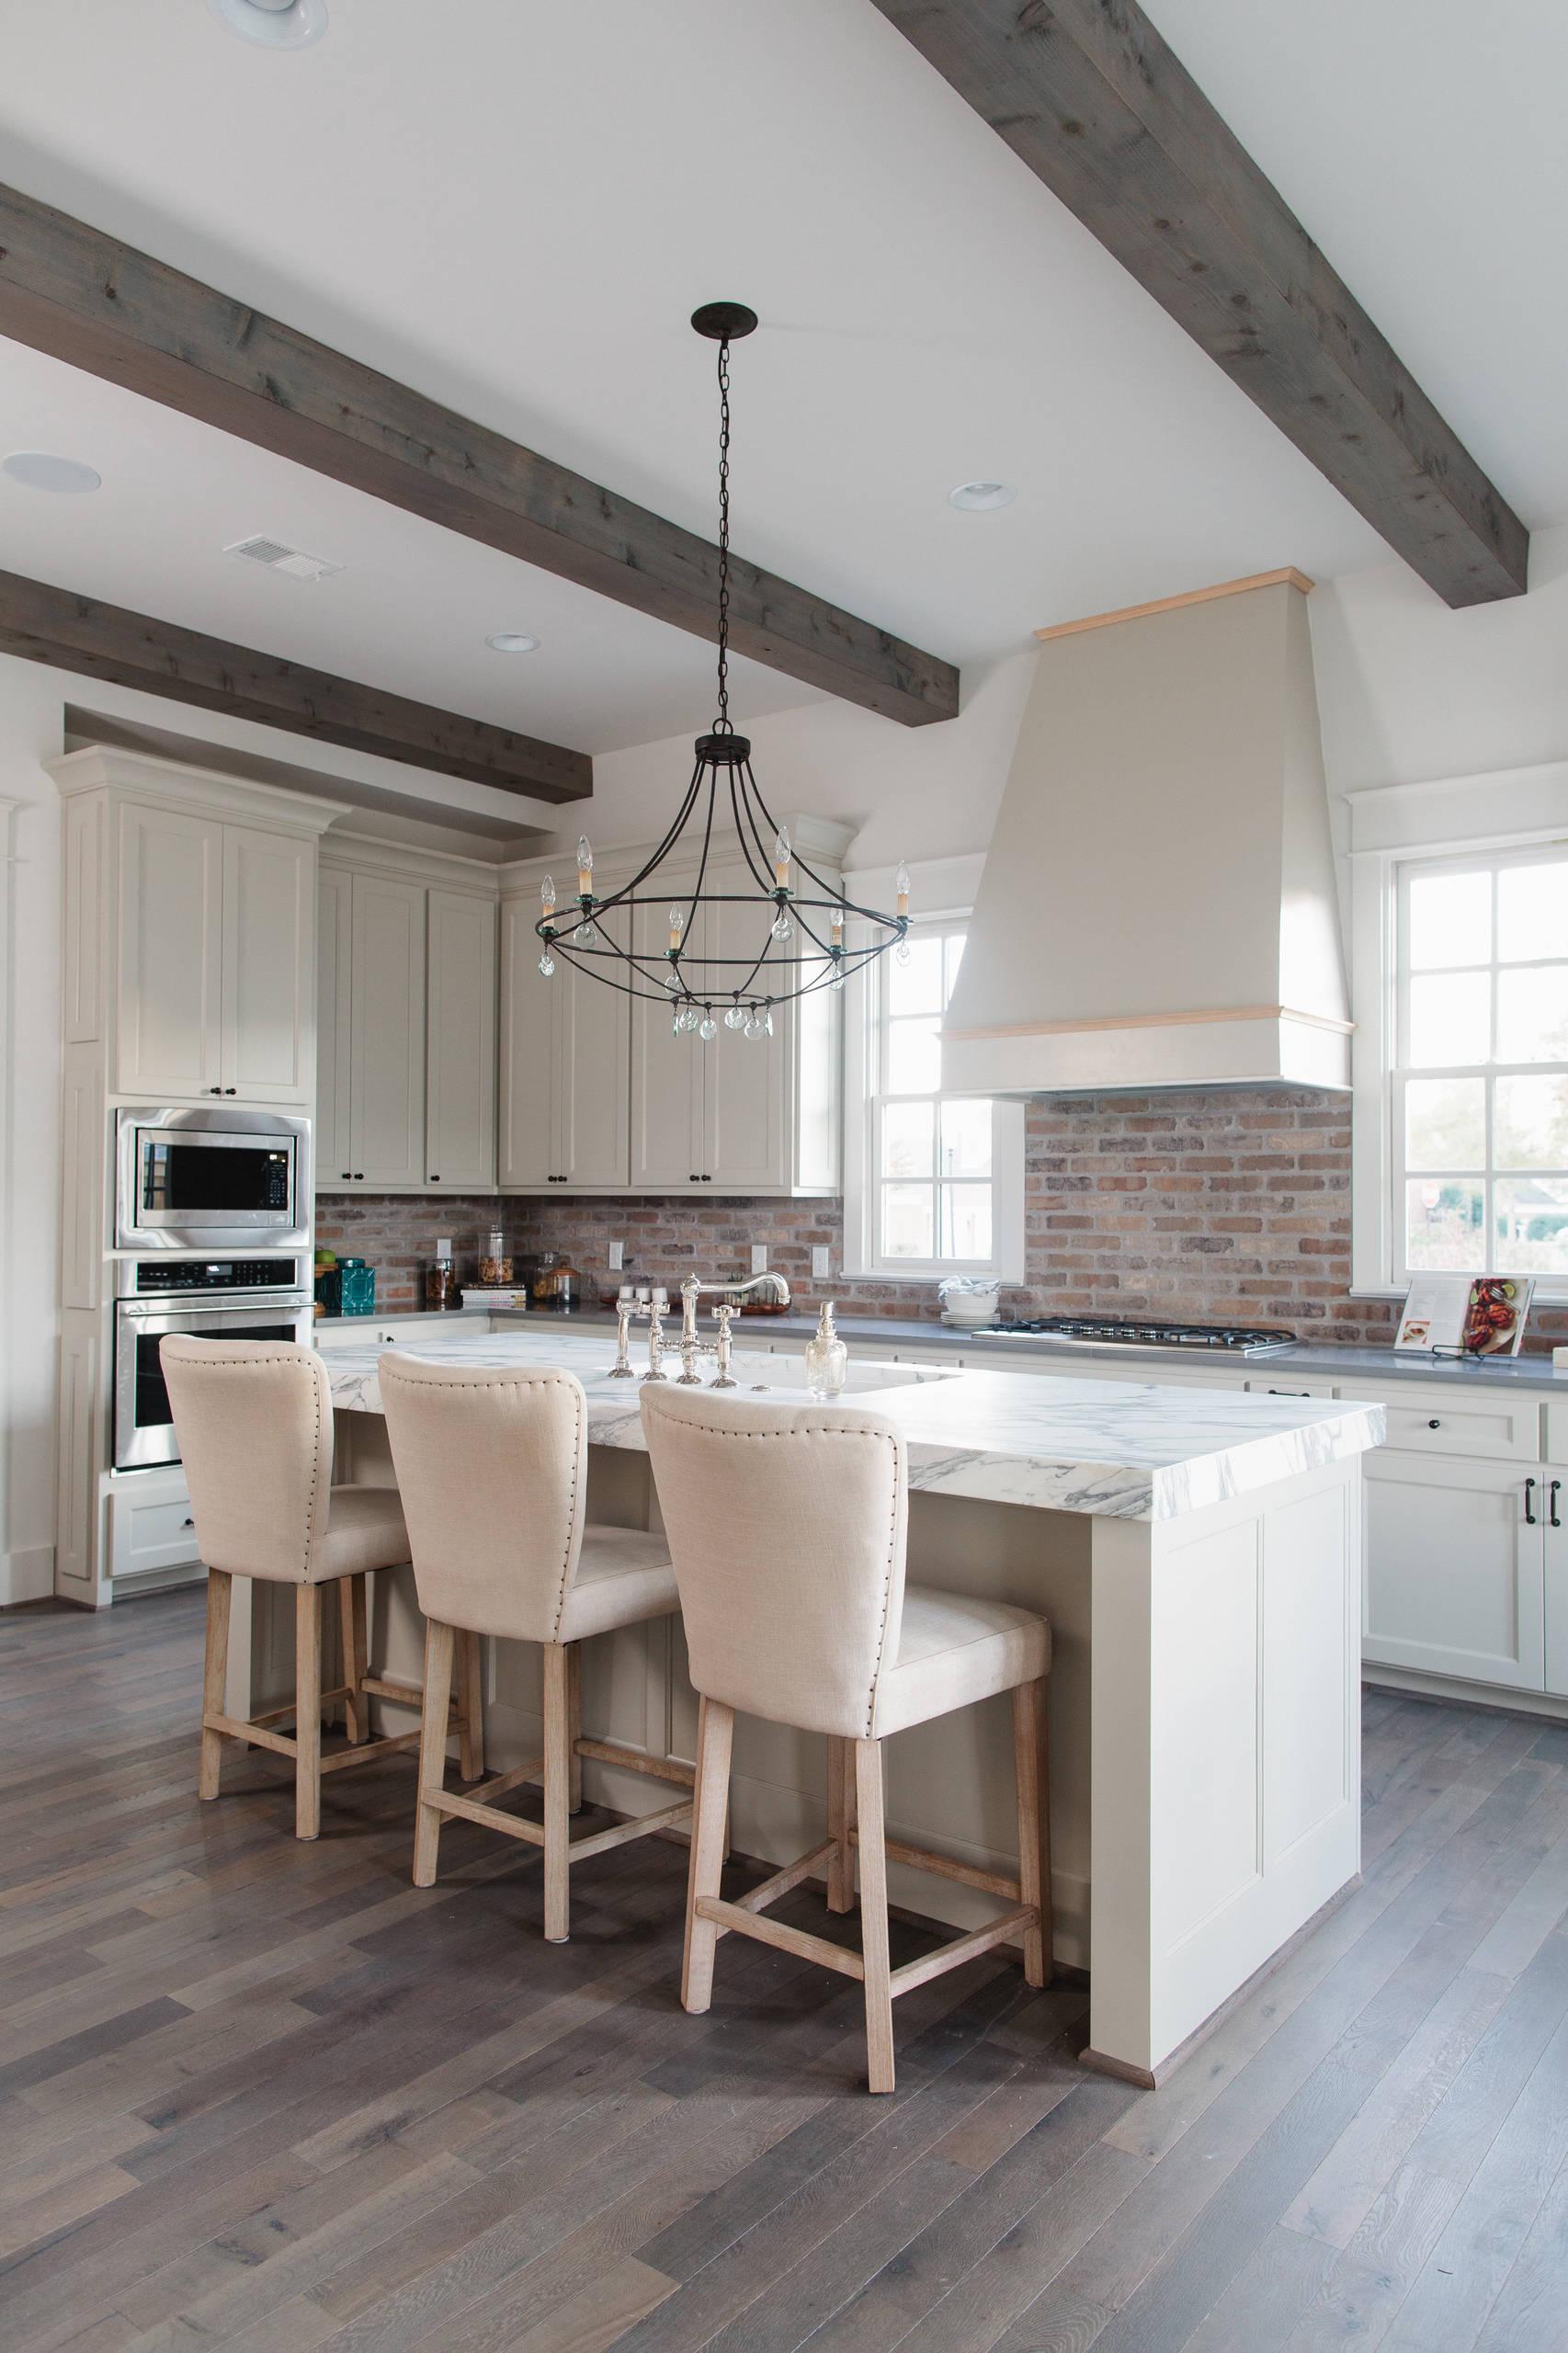 - 75 Beautiful White Kitchen With Brick Backsplash Pictures & Ideas